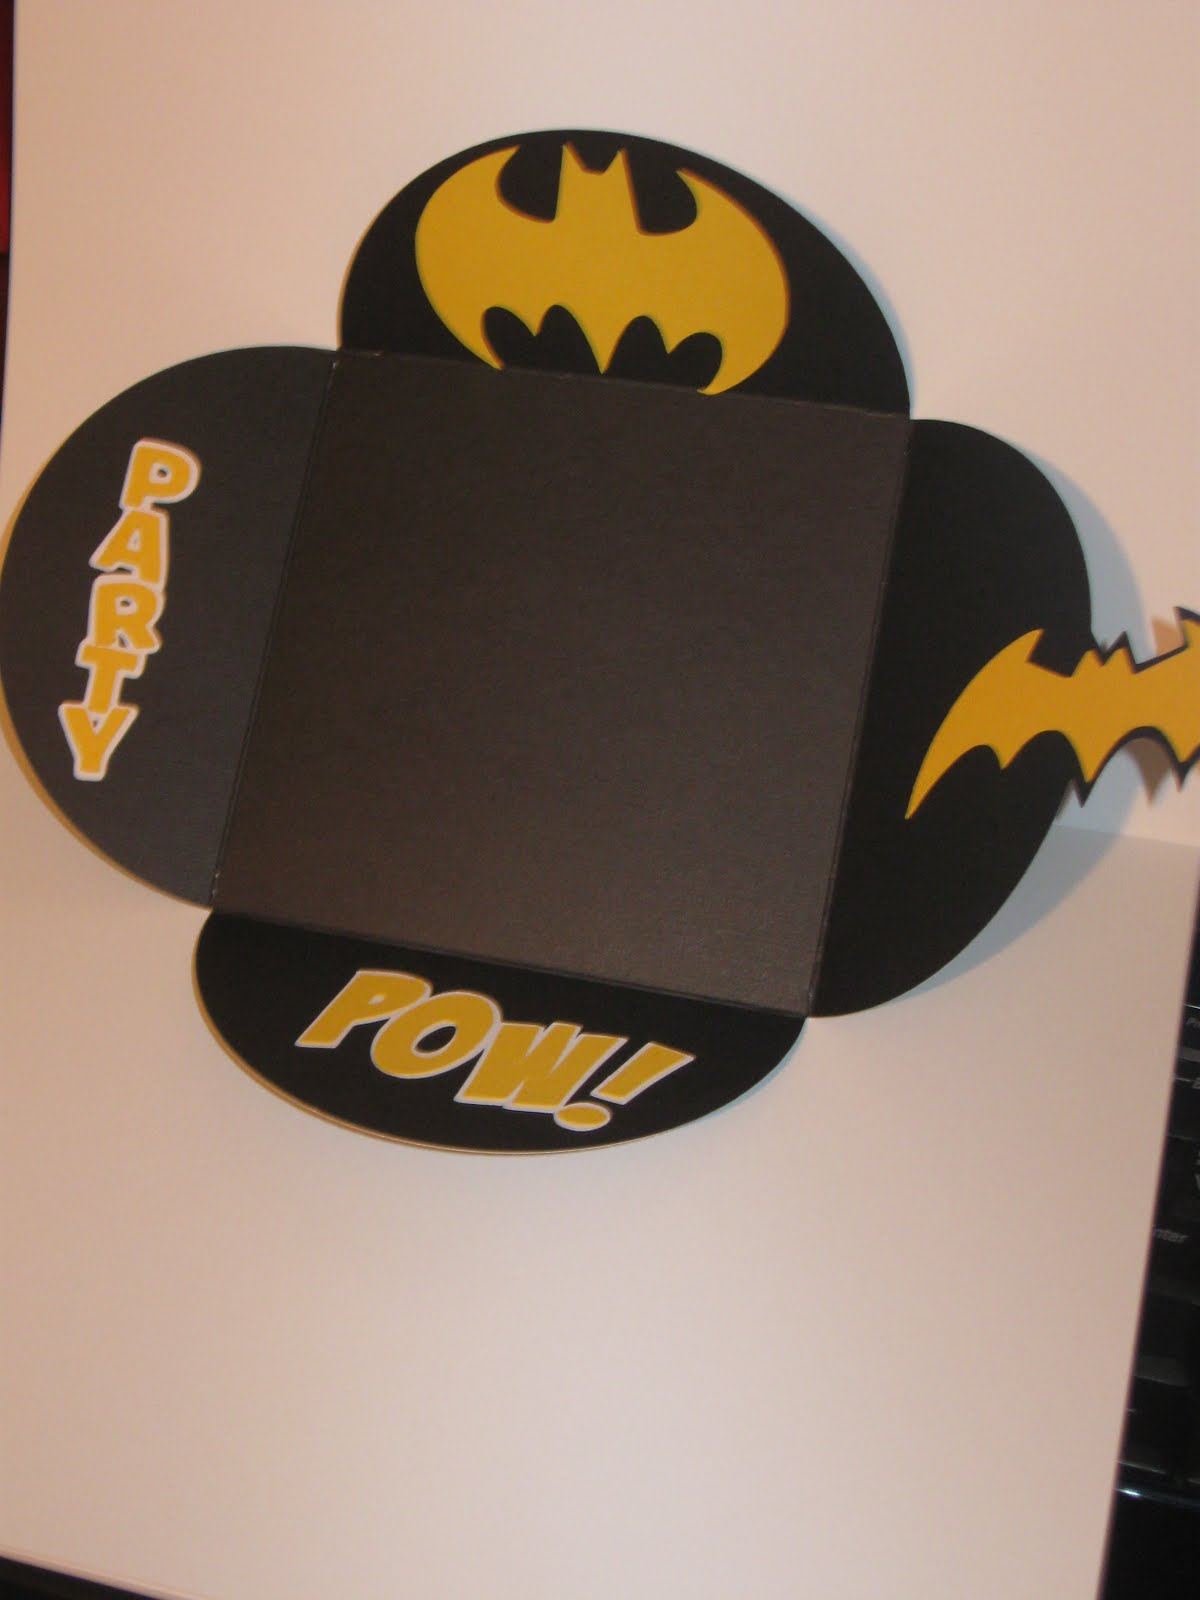 Batman Invitations Templates as adorable invitation template